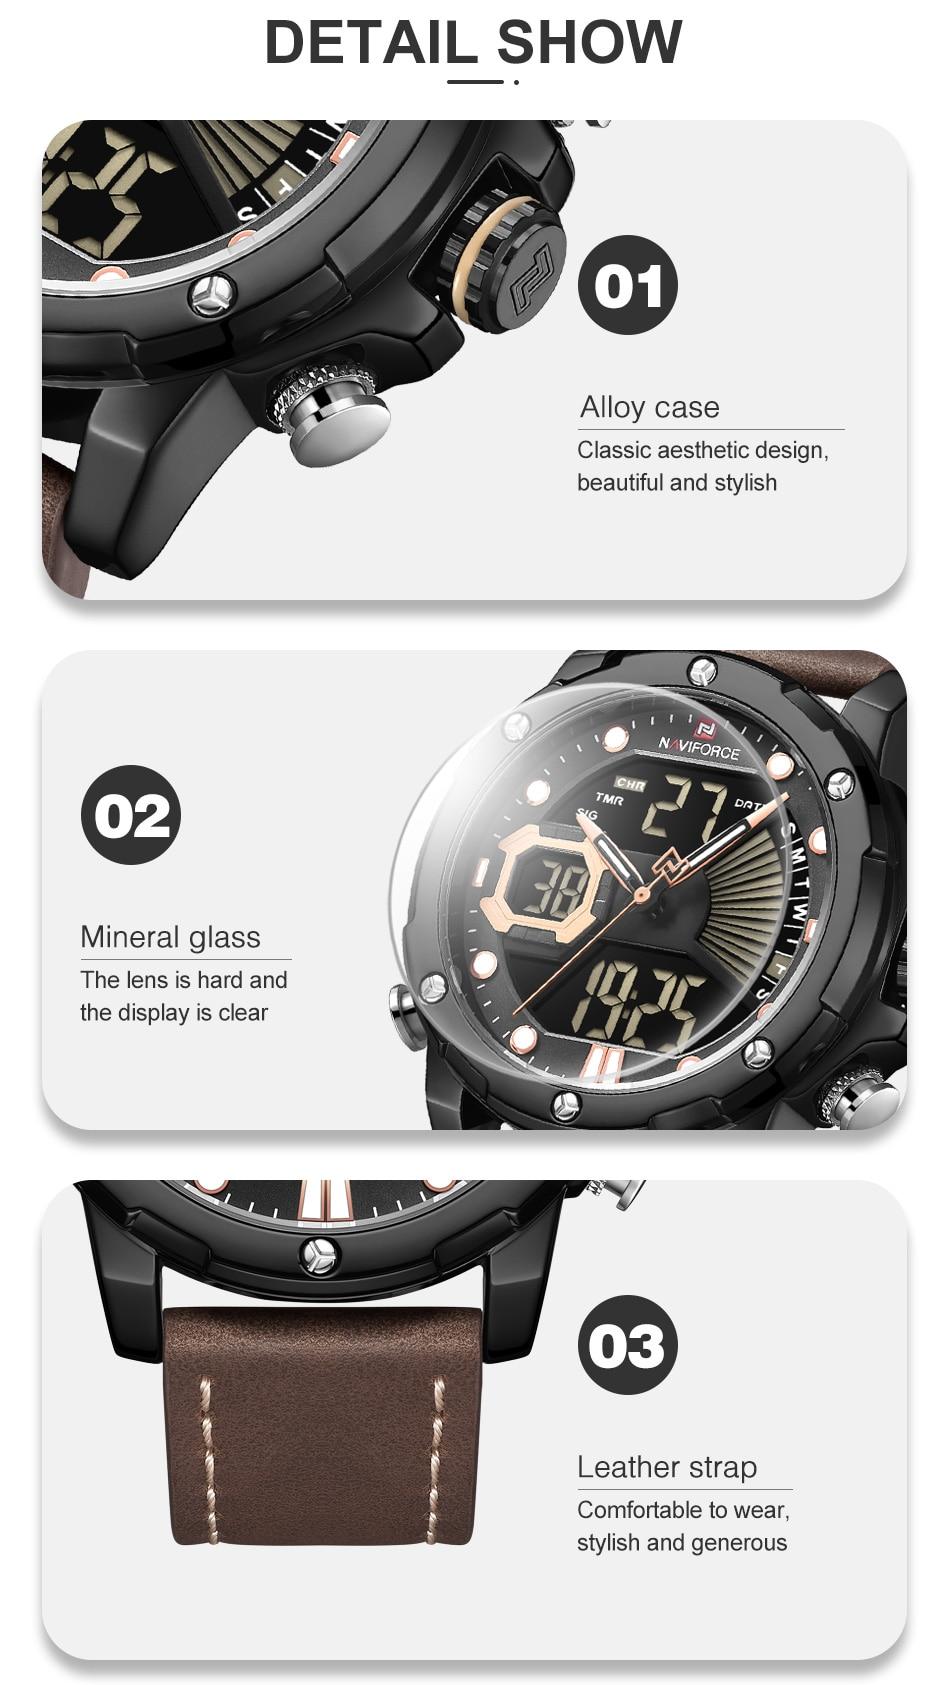 Hfc3cdb439f2a46c990495d79f530c5fdk NAVIFORCE Men Watch Top Luxury Brand Fashion Sports Wristwatch